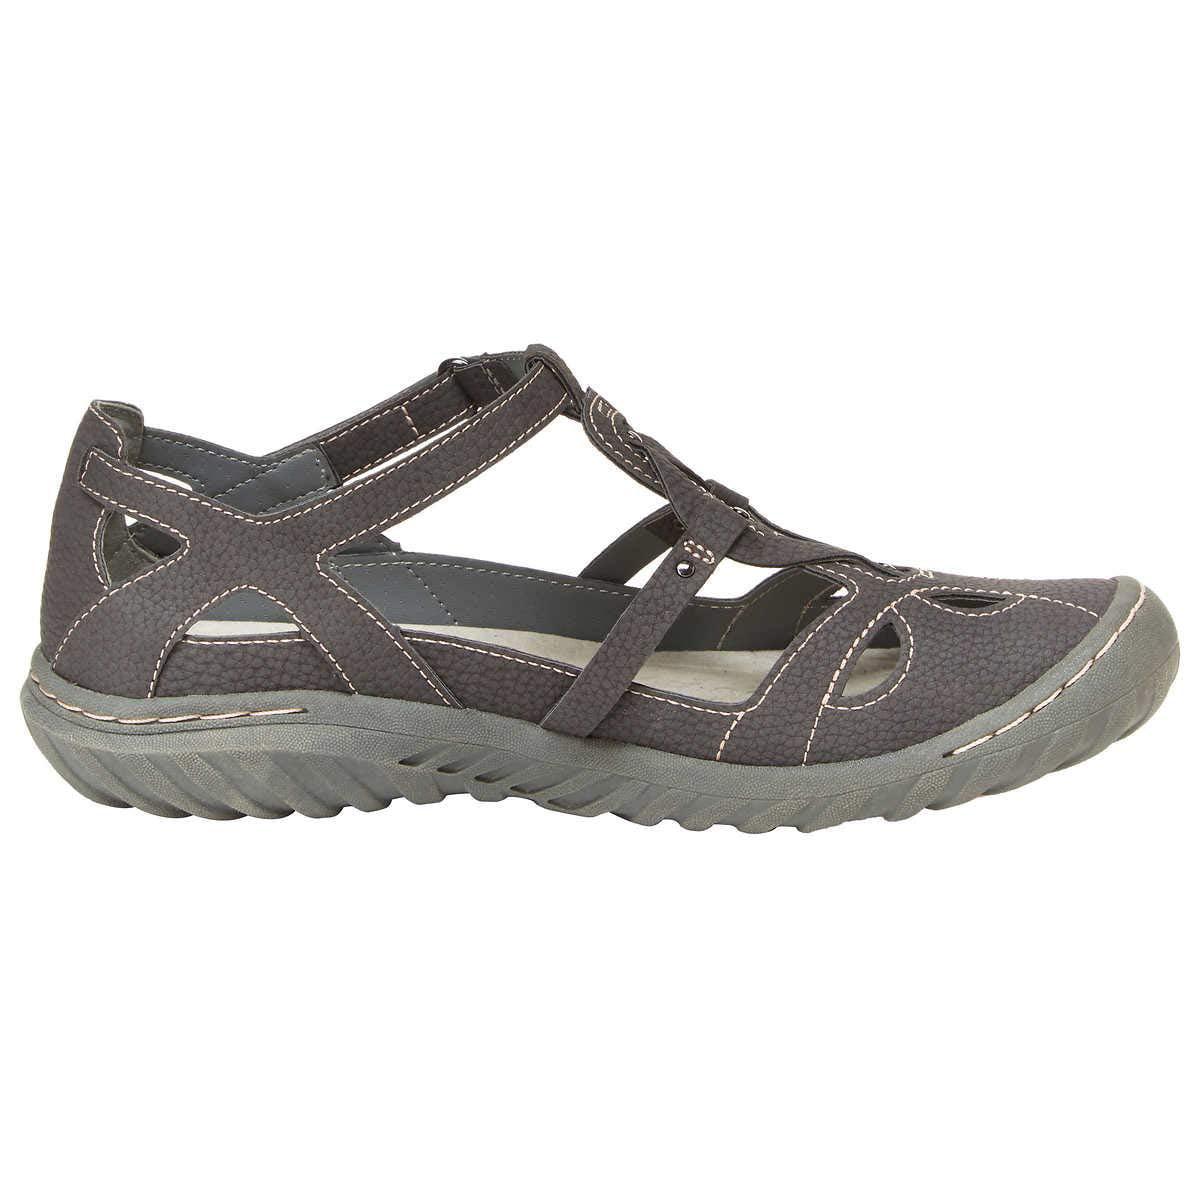 5c20919614db4 JBU by Jambu Ladies' Sydney Sandal/Flat Sandals for Women - Charcoal 7